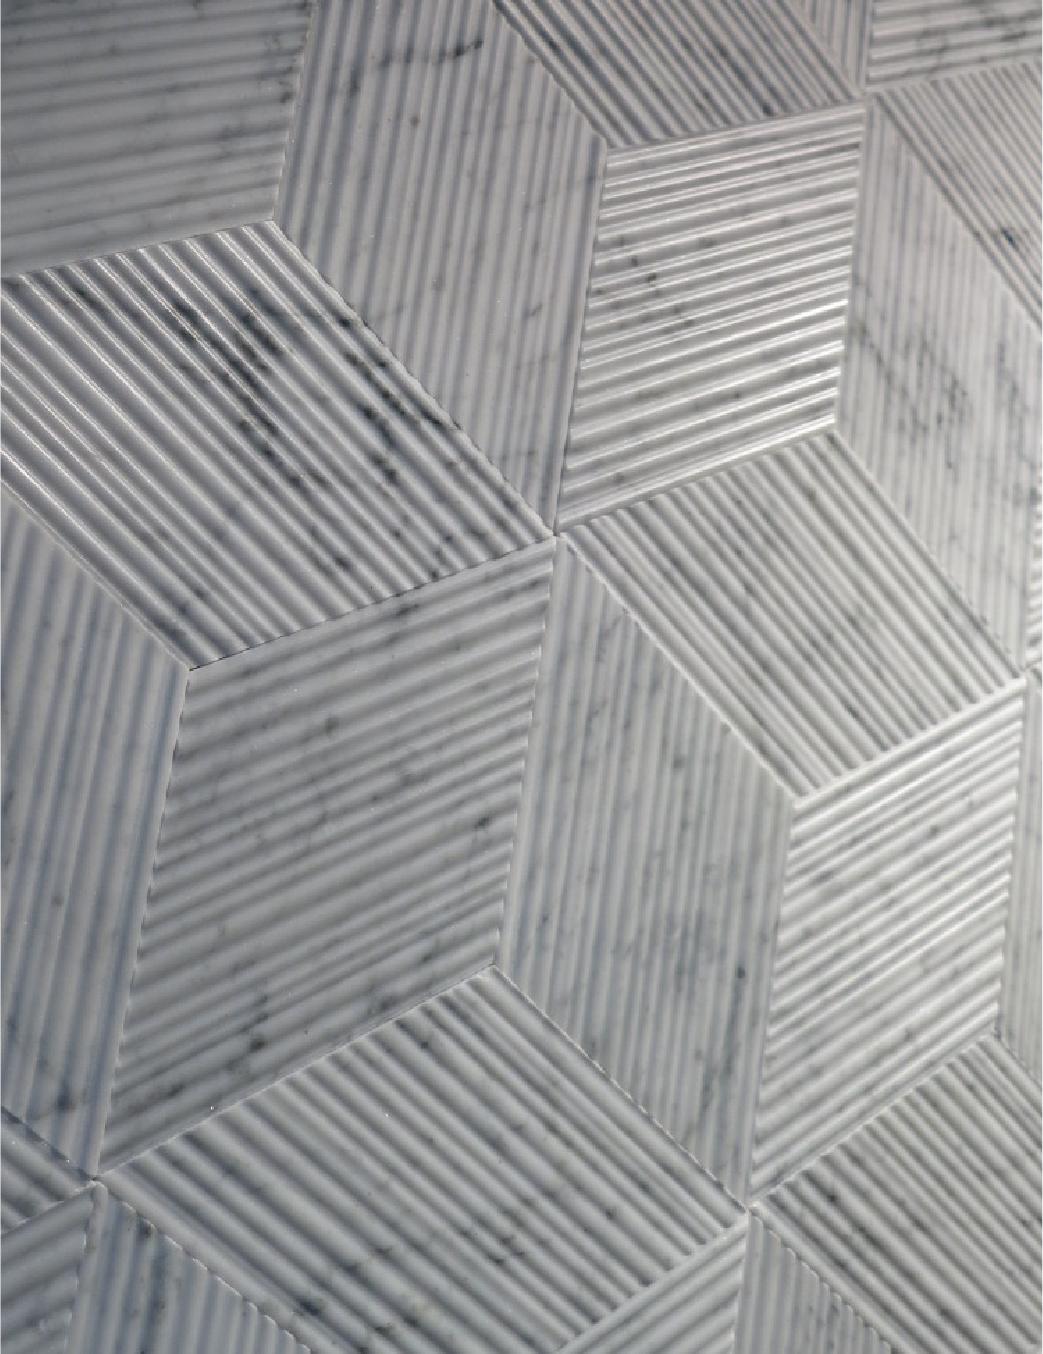 Dynamic tessellation of Carrara marble tiles